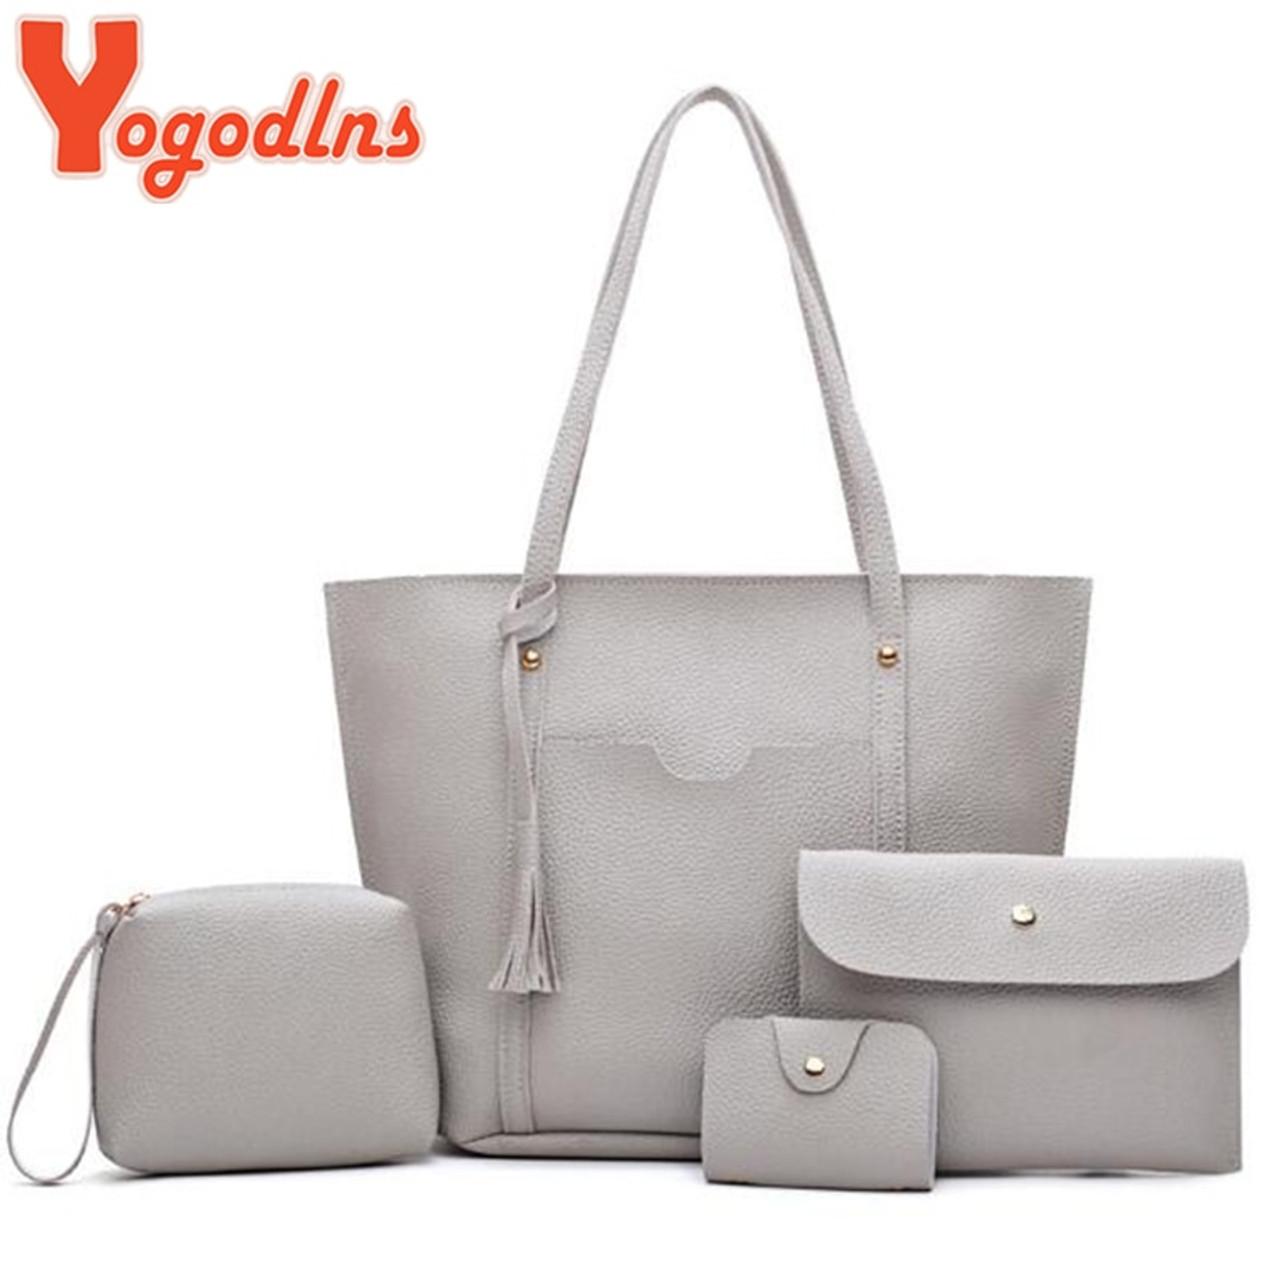 a218c4840583 Yogodlns brand 4 pcs set handbag women composite bag female large capacity  tote bag fashion shoulder ...